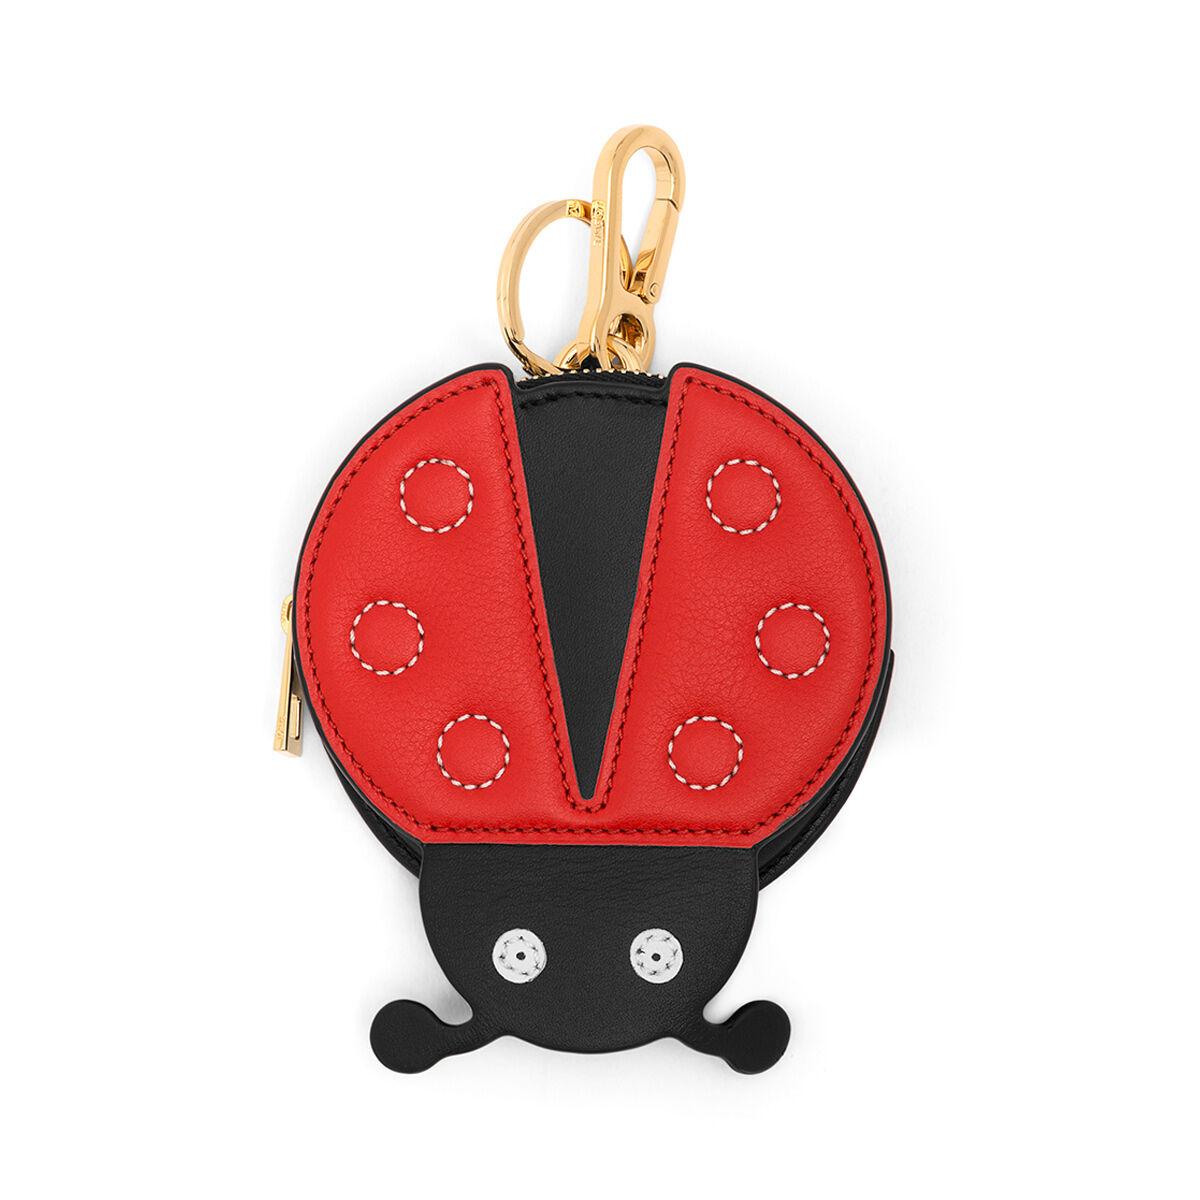 7451 Charm 115 28 Ladybug galleta Loewe Redblackpalladium 111 All de EtqCxHH